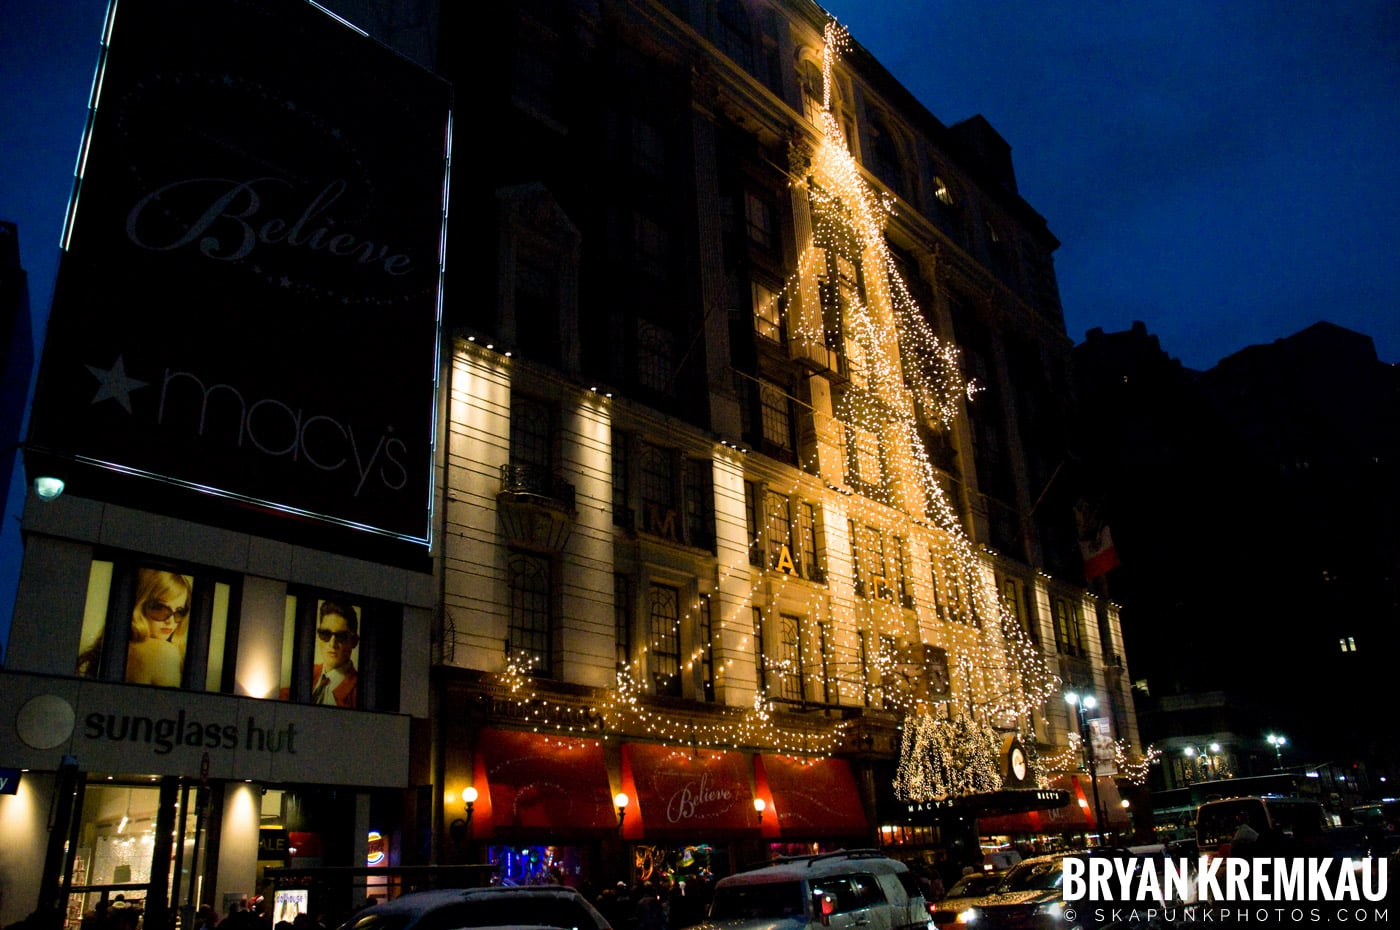 NYC Holiday Trip - 12.20.08 (21)